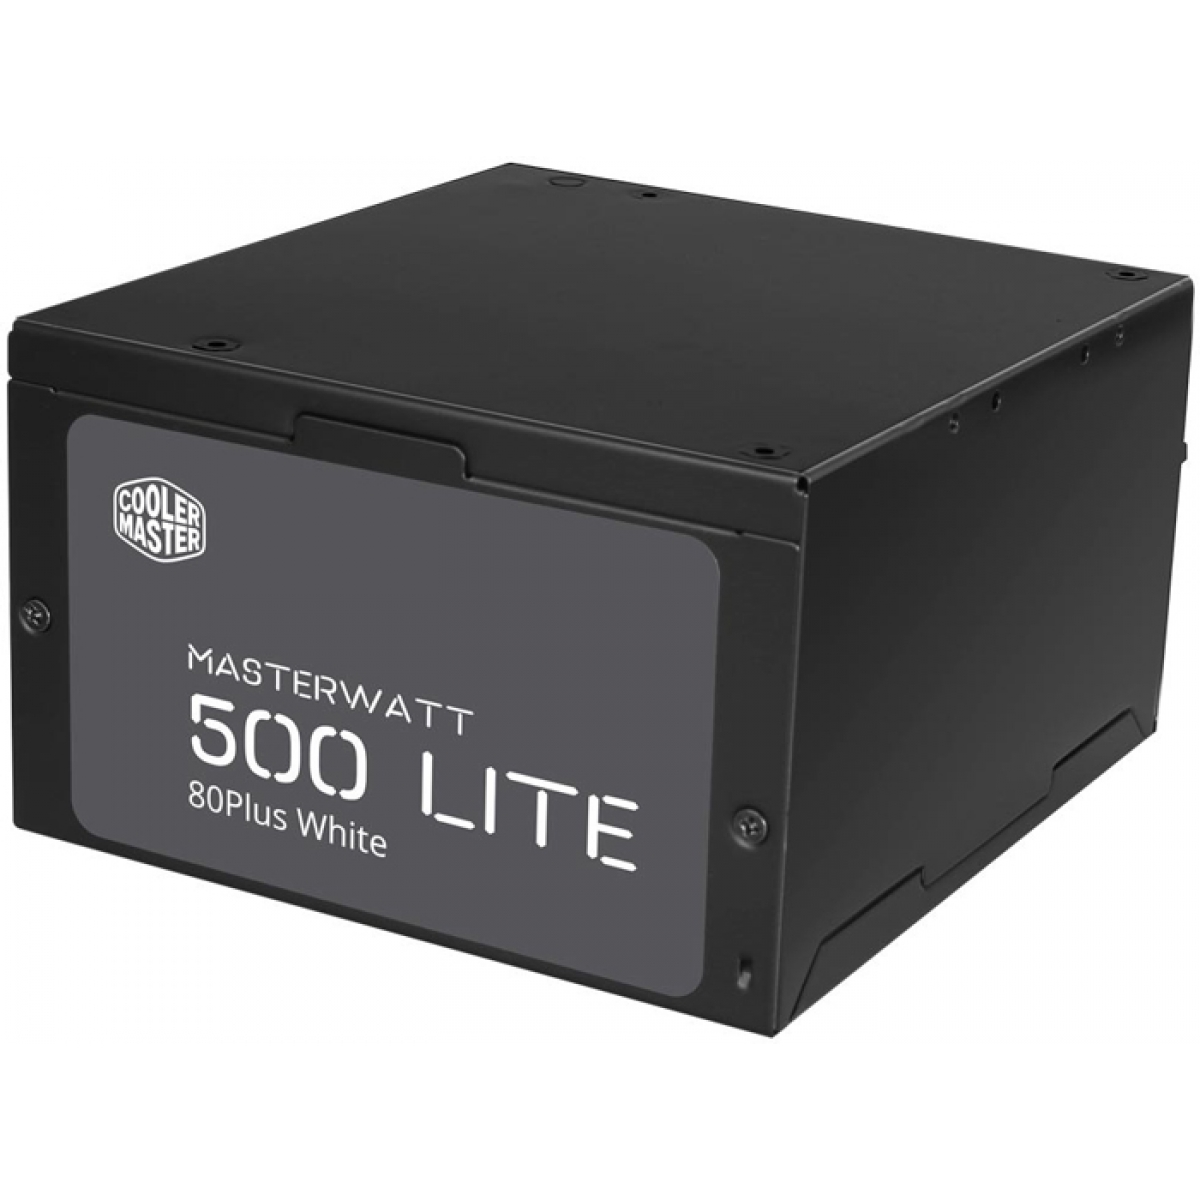 Fonte Cooler Master Masterwatt Lite 500W, 80 Plus White, PFC Ativo, MPX-5001-ACAAW-WO